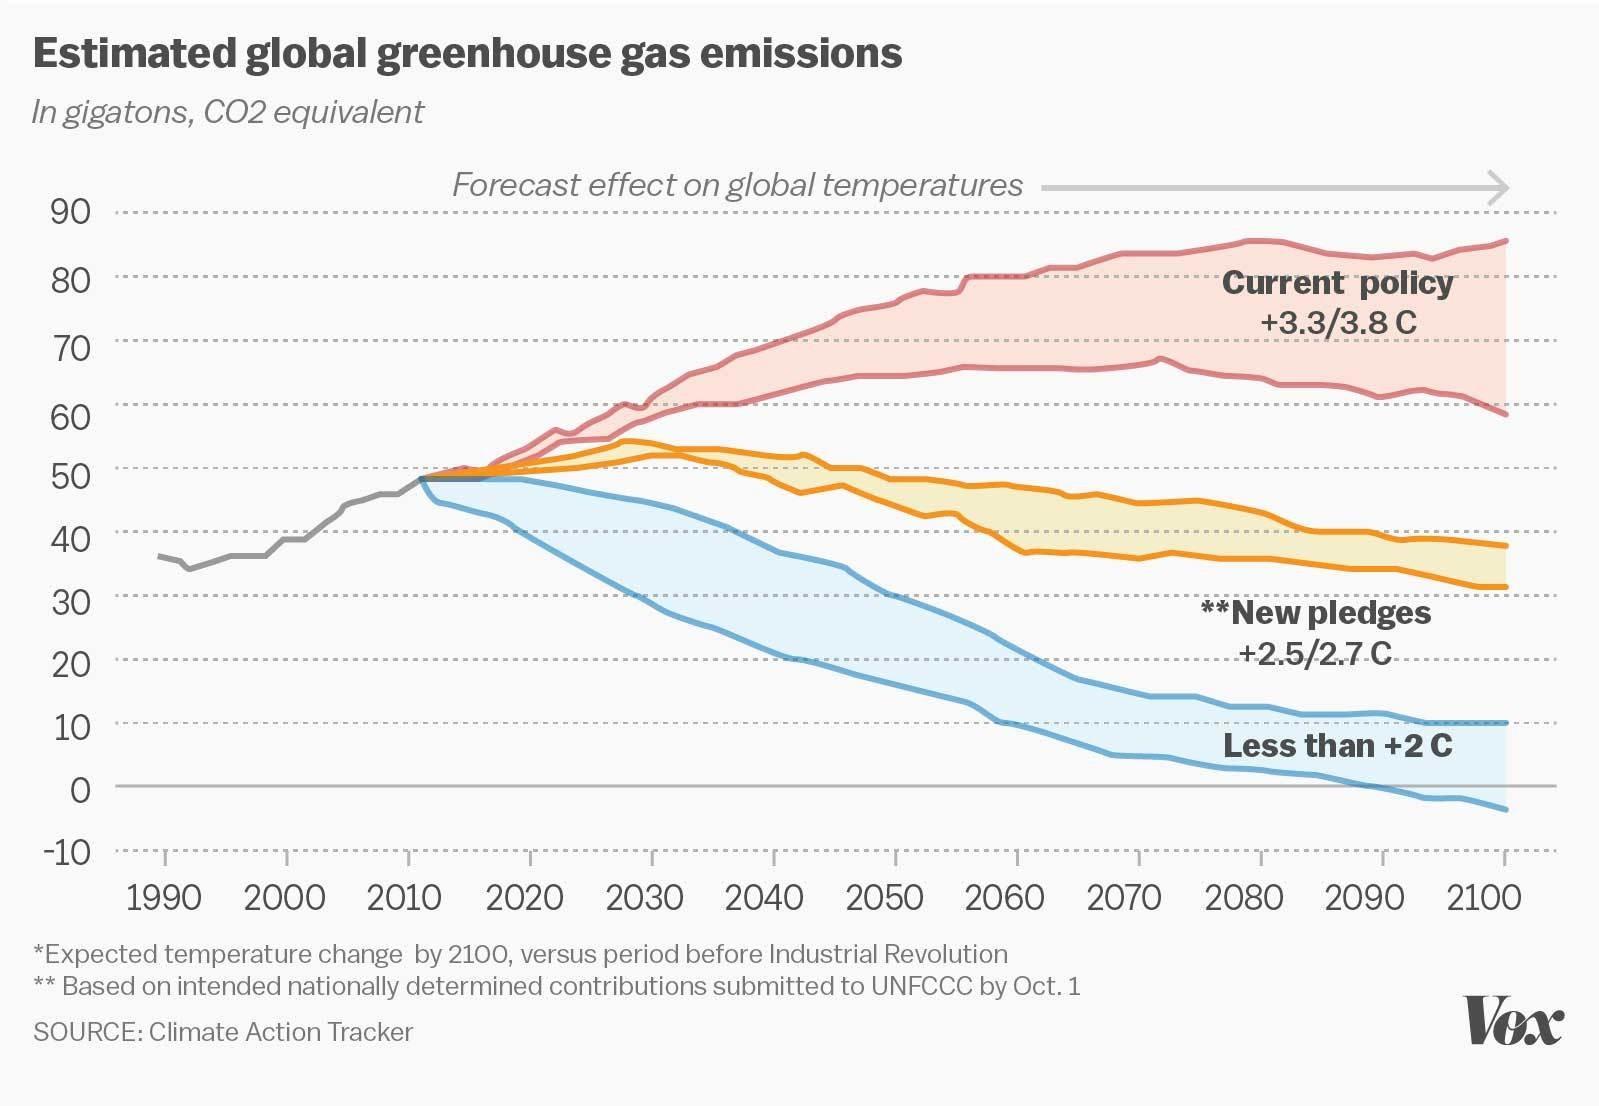 5 Factors That Could Cause The Paris Climate Deal To Fail